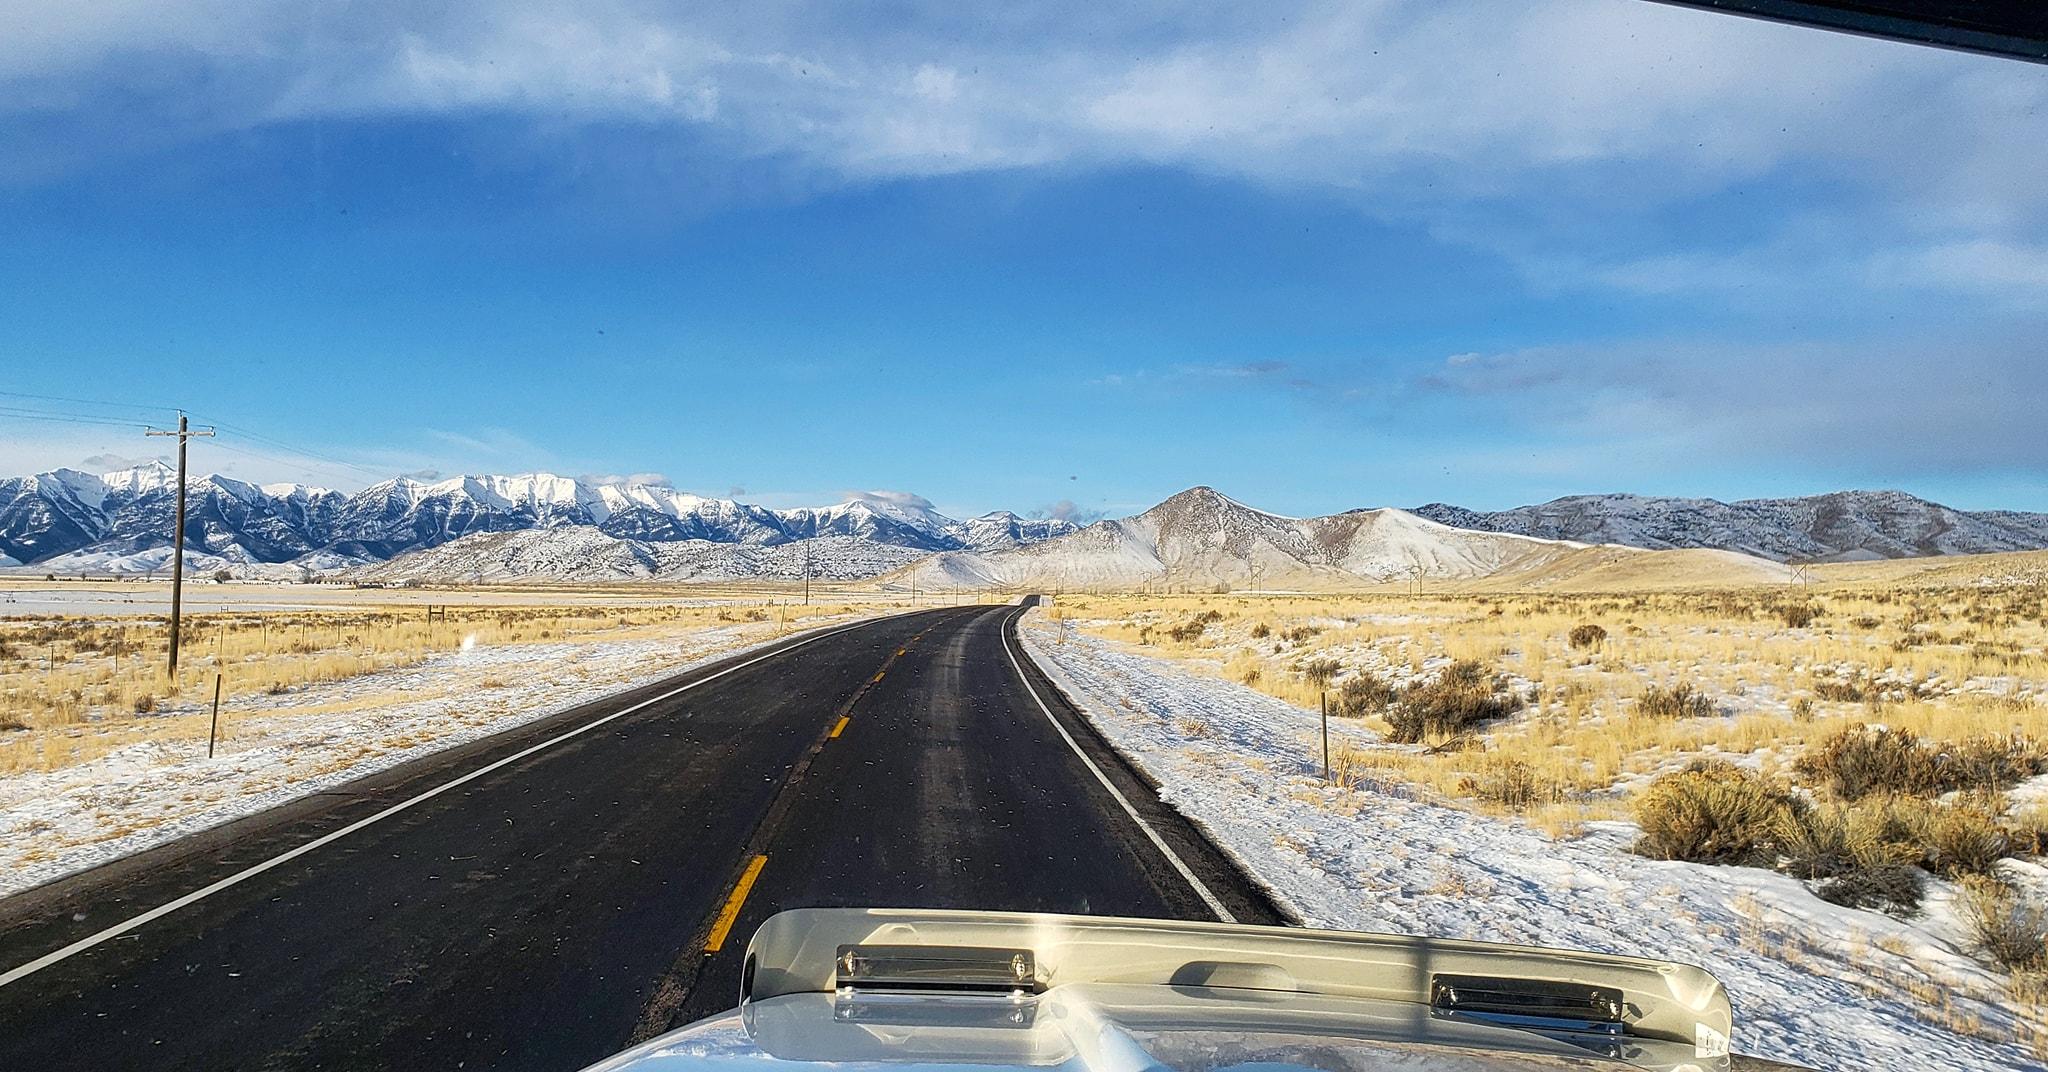 Dirk-Pieter-Verbeek-reis-naar-Idaho-13-1-2019--8